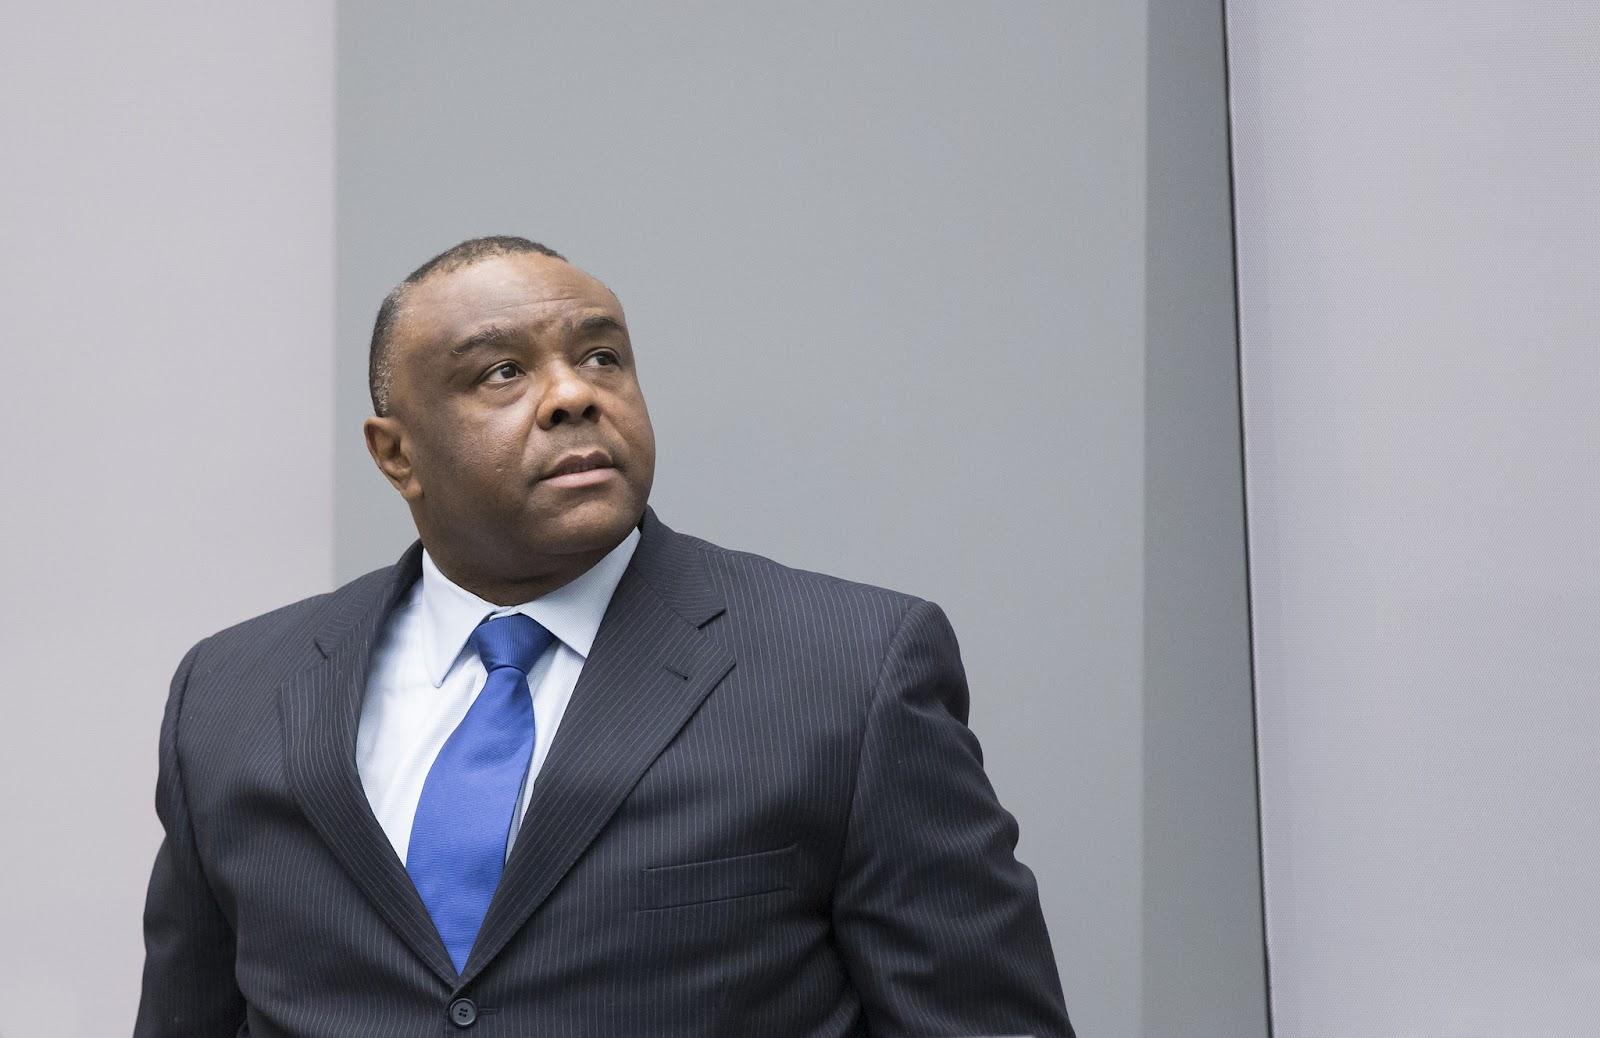 Jean-Pierre Bemba at his sentencing hearing. Credit: ICC-CPI.